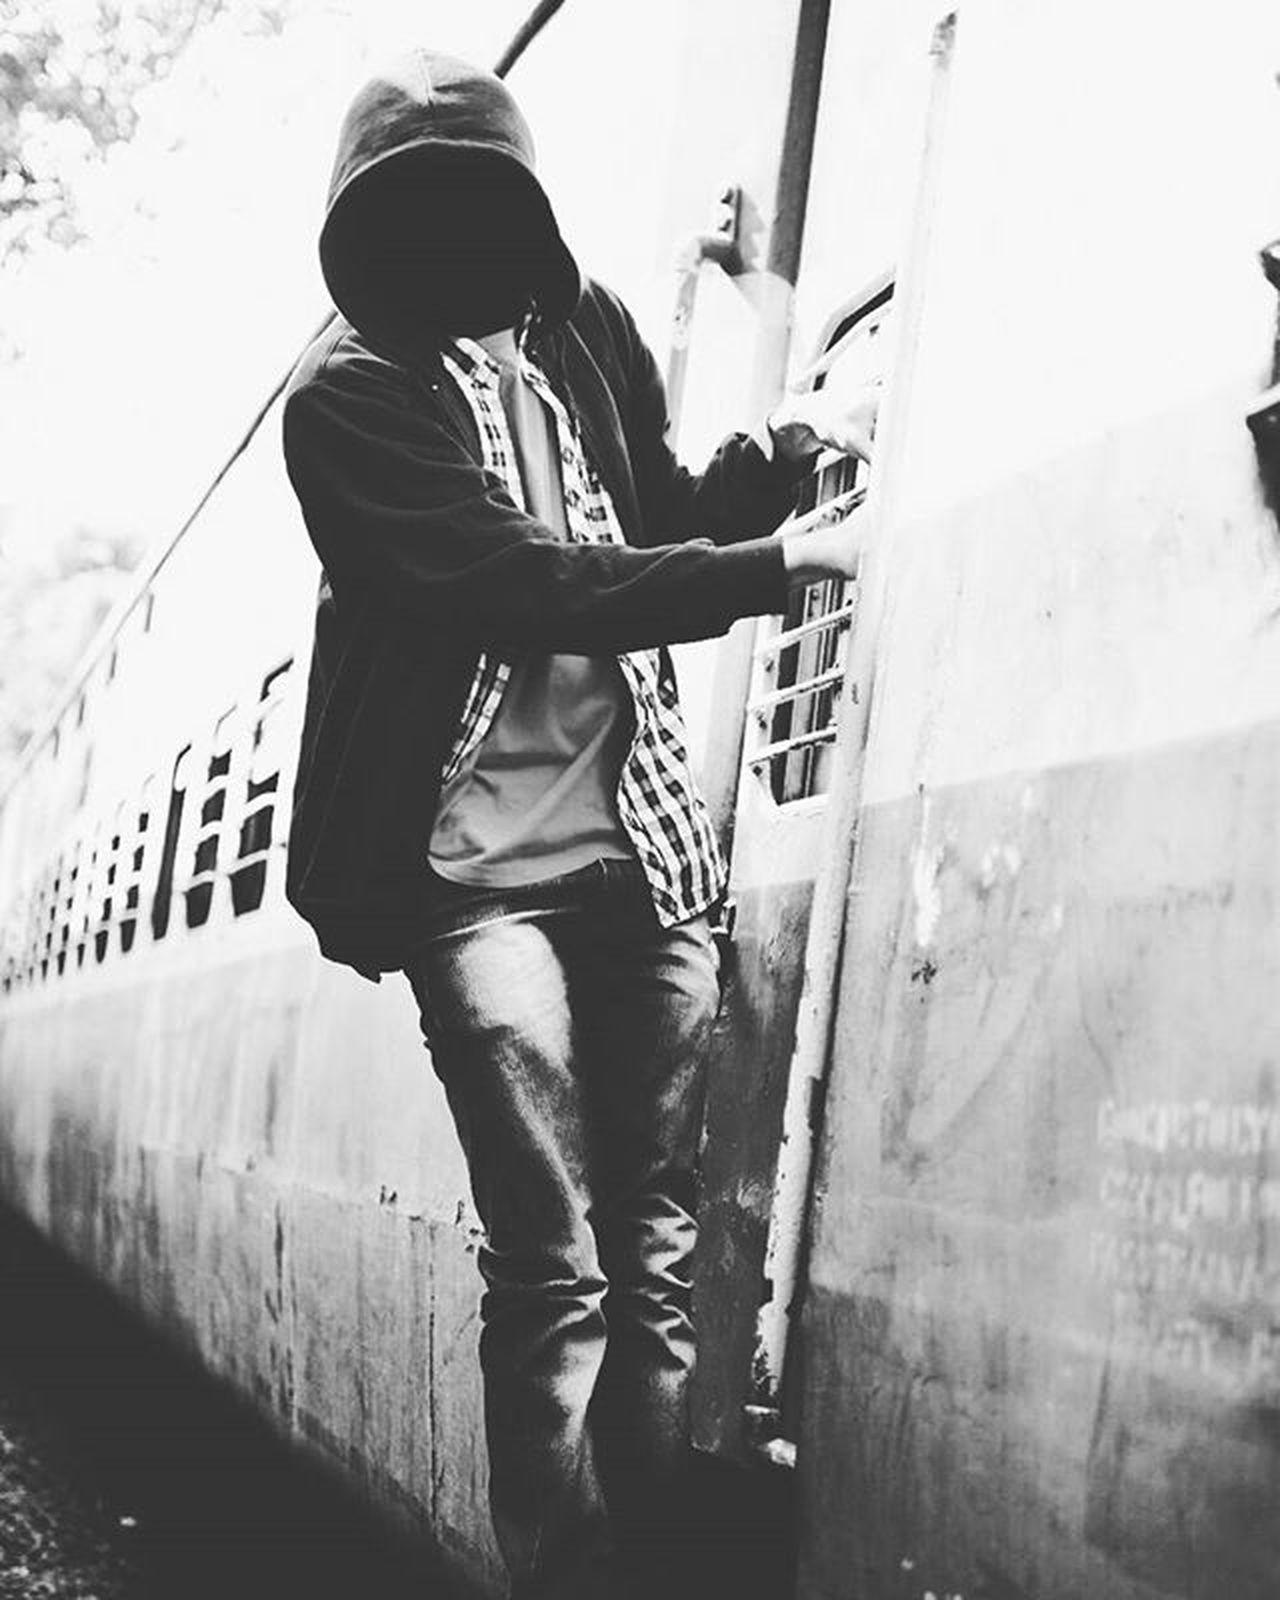 Phoneonly Vscocam Thatfacelessfeel Train Blackandwhite Bnw Urban